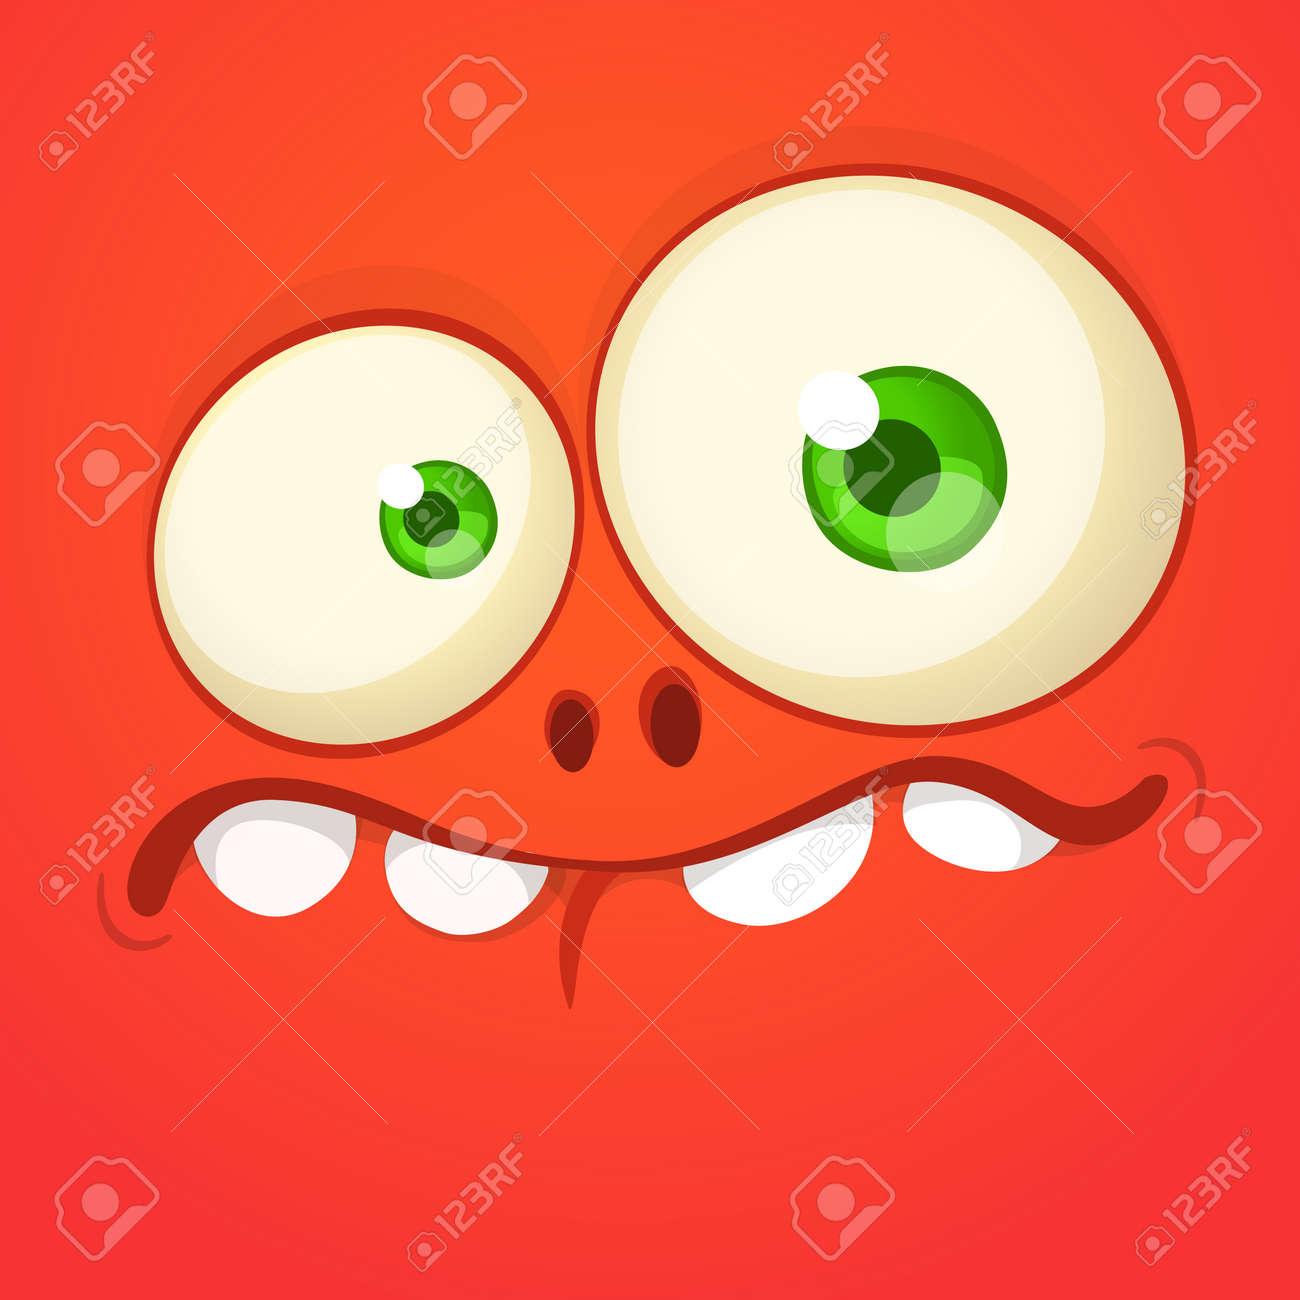 Funny cartoon monster face. Vector Halloween monster square avatar - 150903295